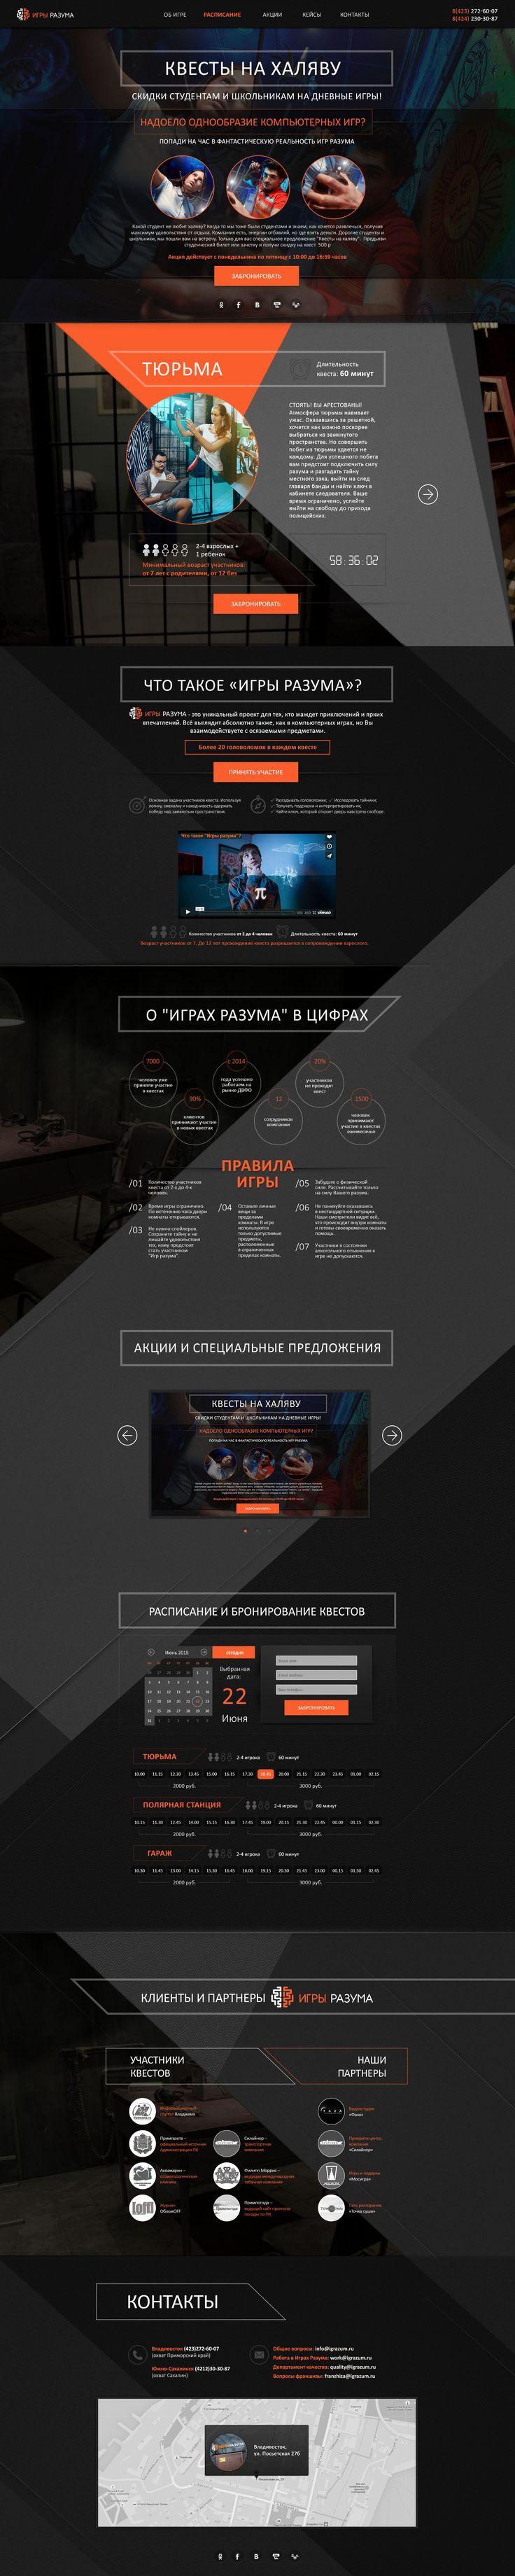 """IGRAZUM""  Quest Room  #landing, #page, #design, #web, #HTML5, #photoshop, #website"